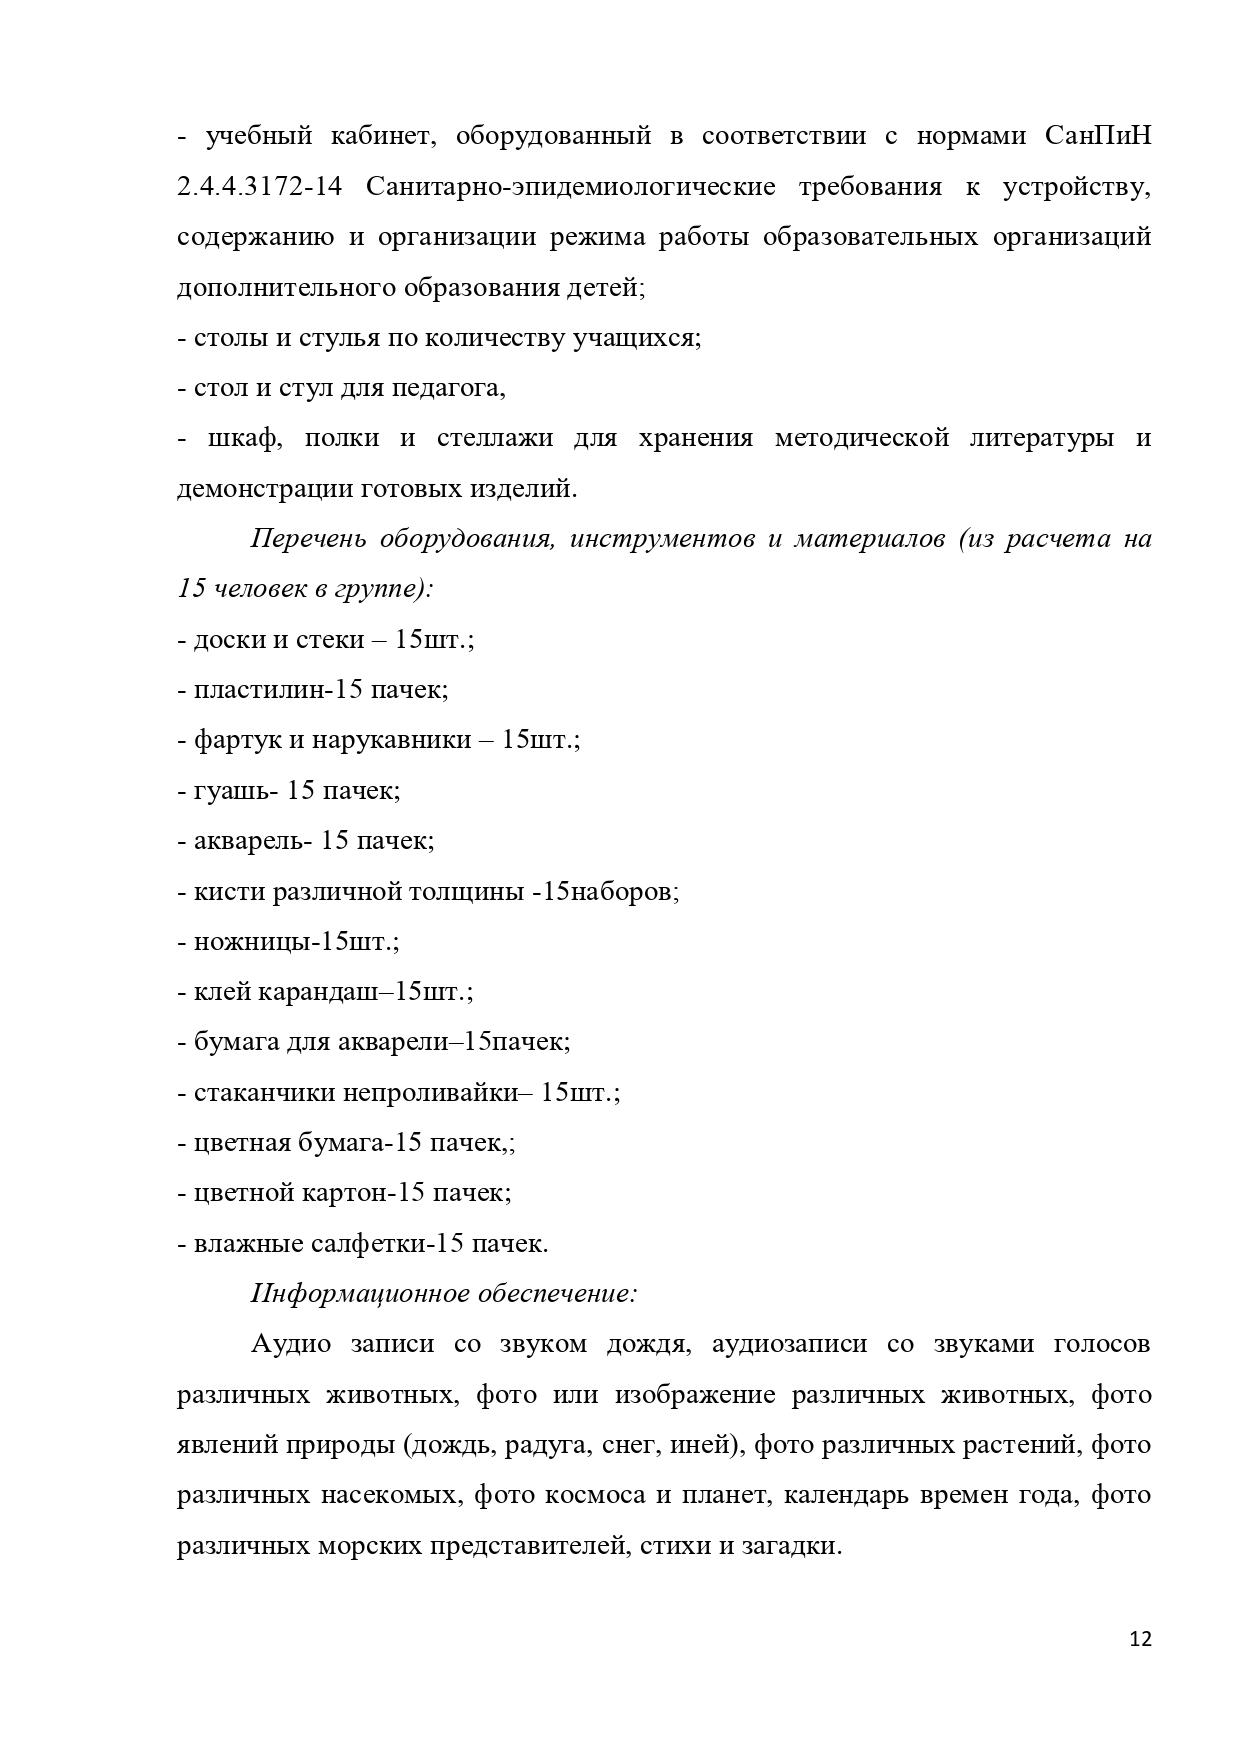 ДООП От познания к творчеству_pages-to-jpg-0012